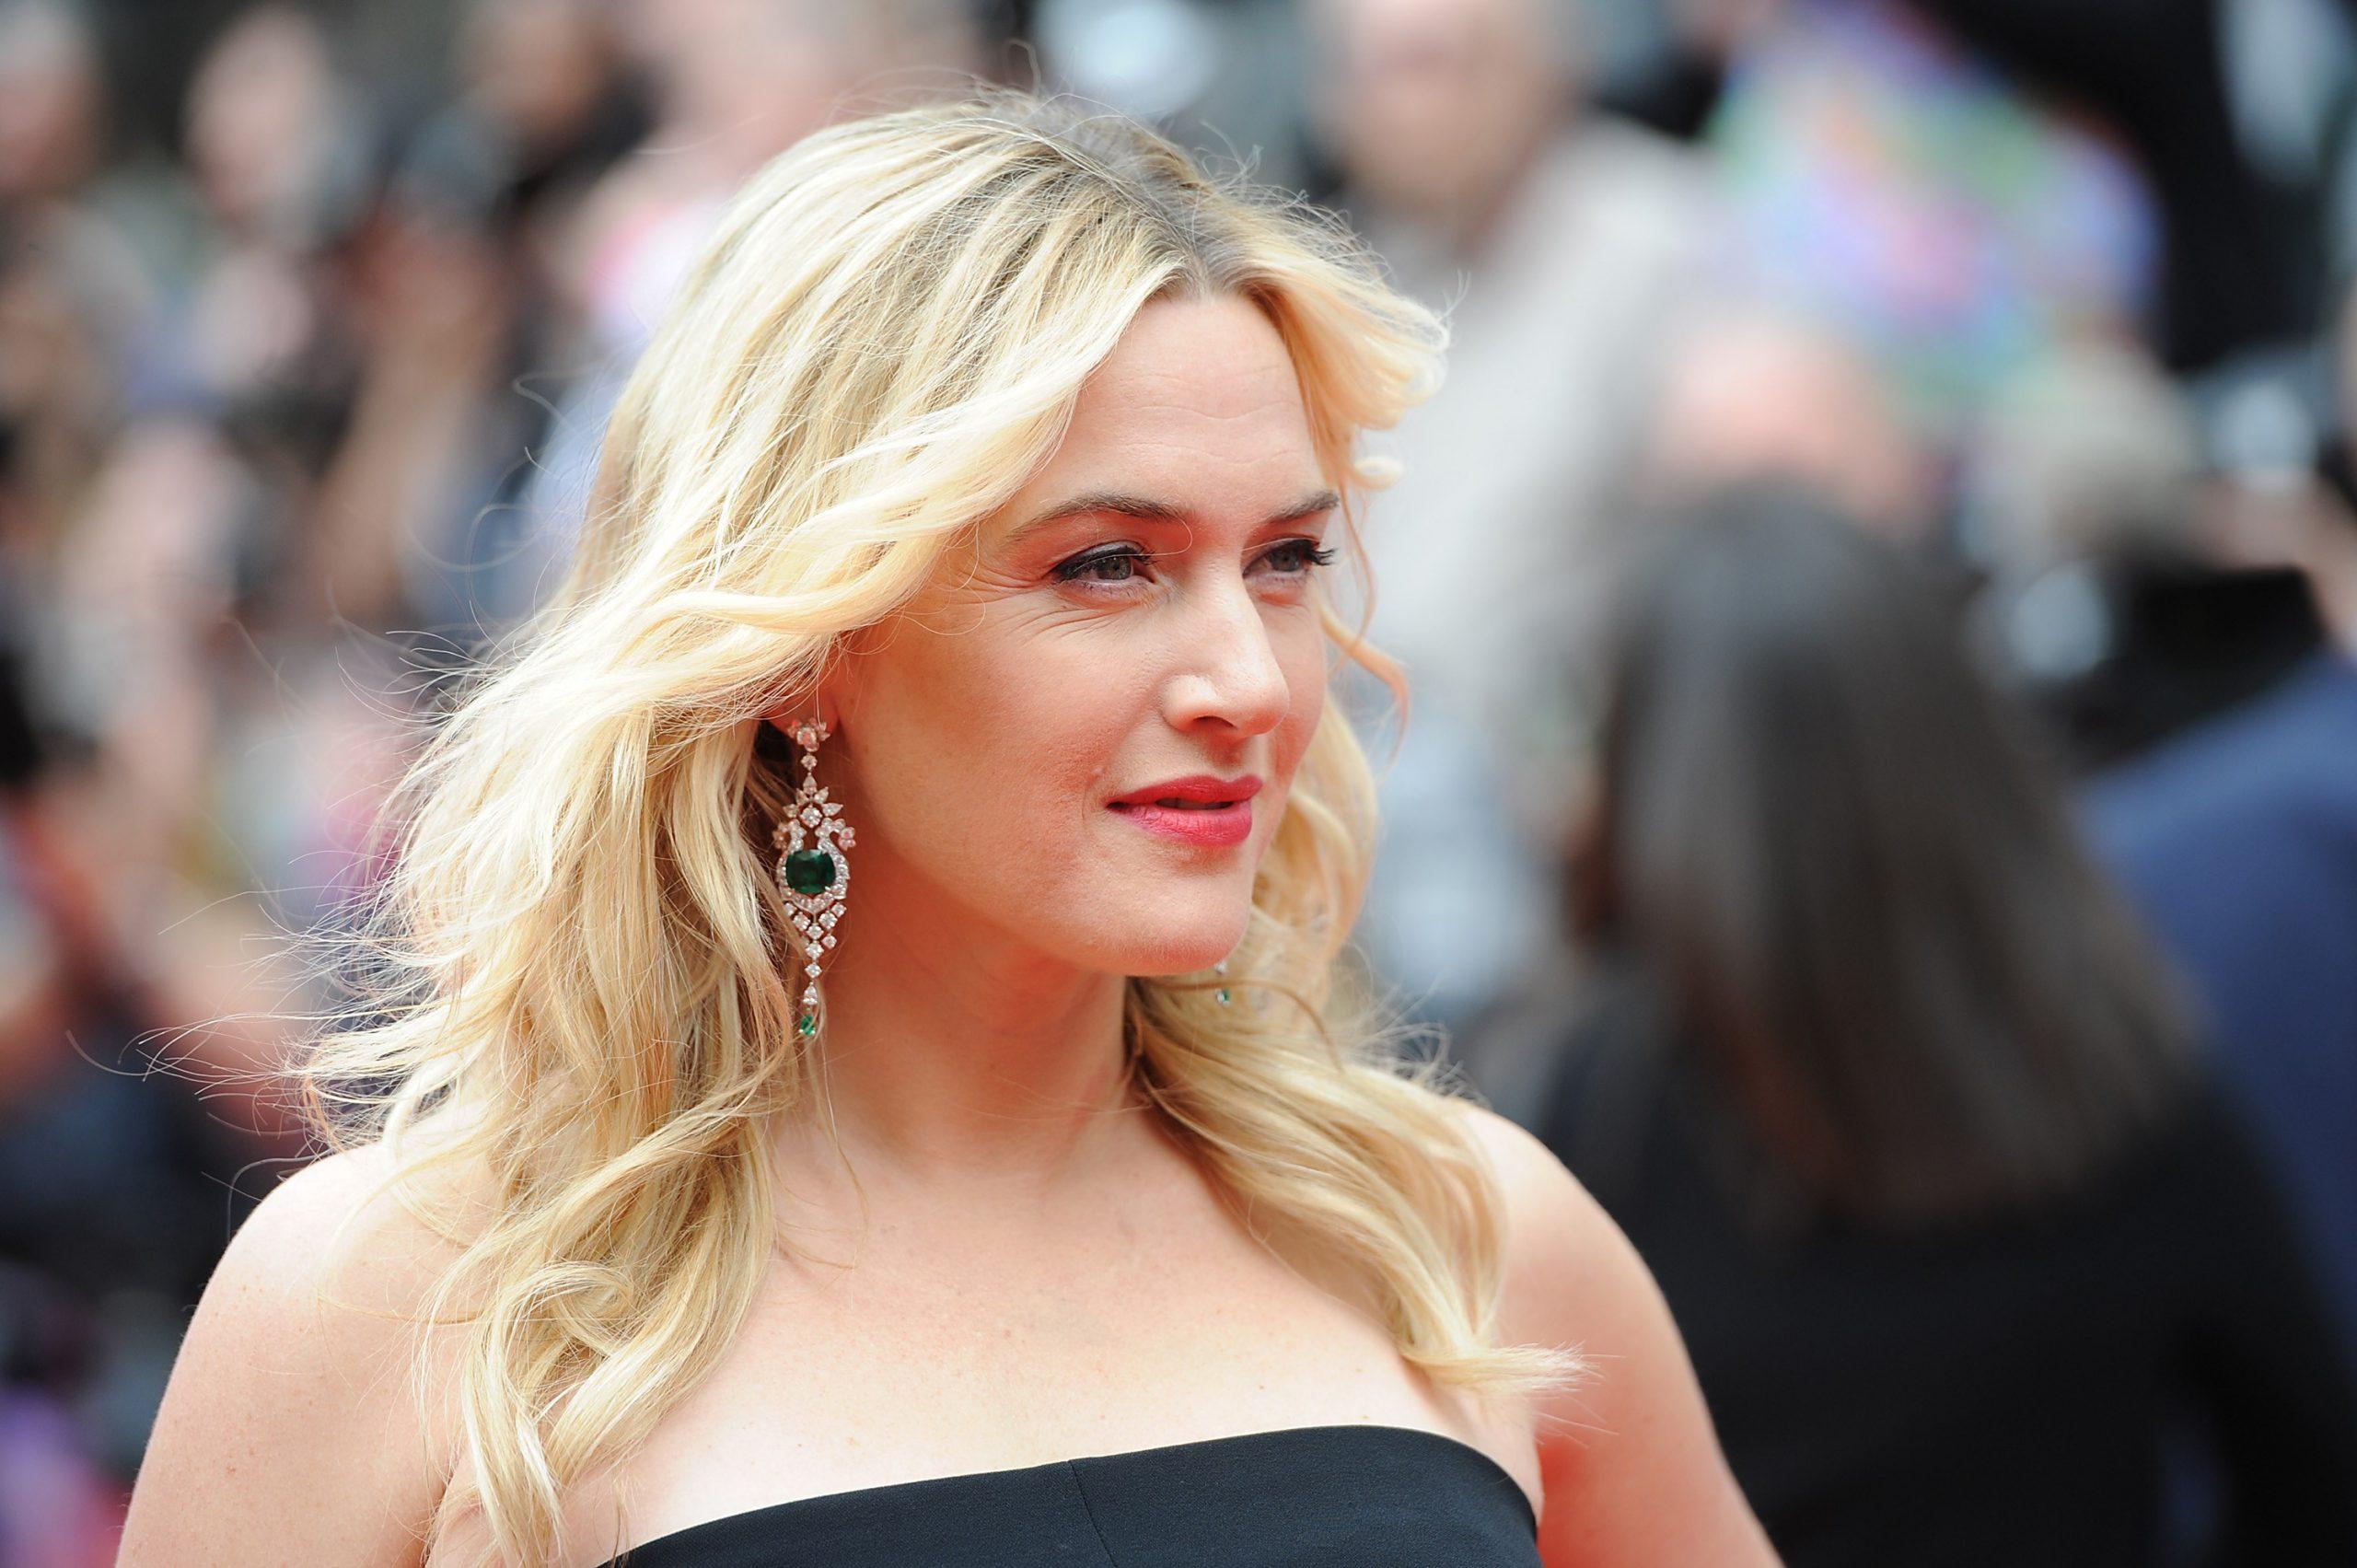 Against retouching: Kate Winslet